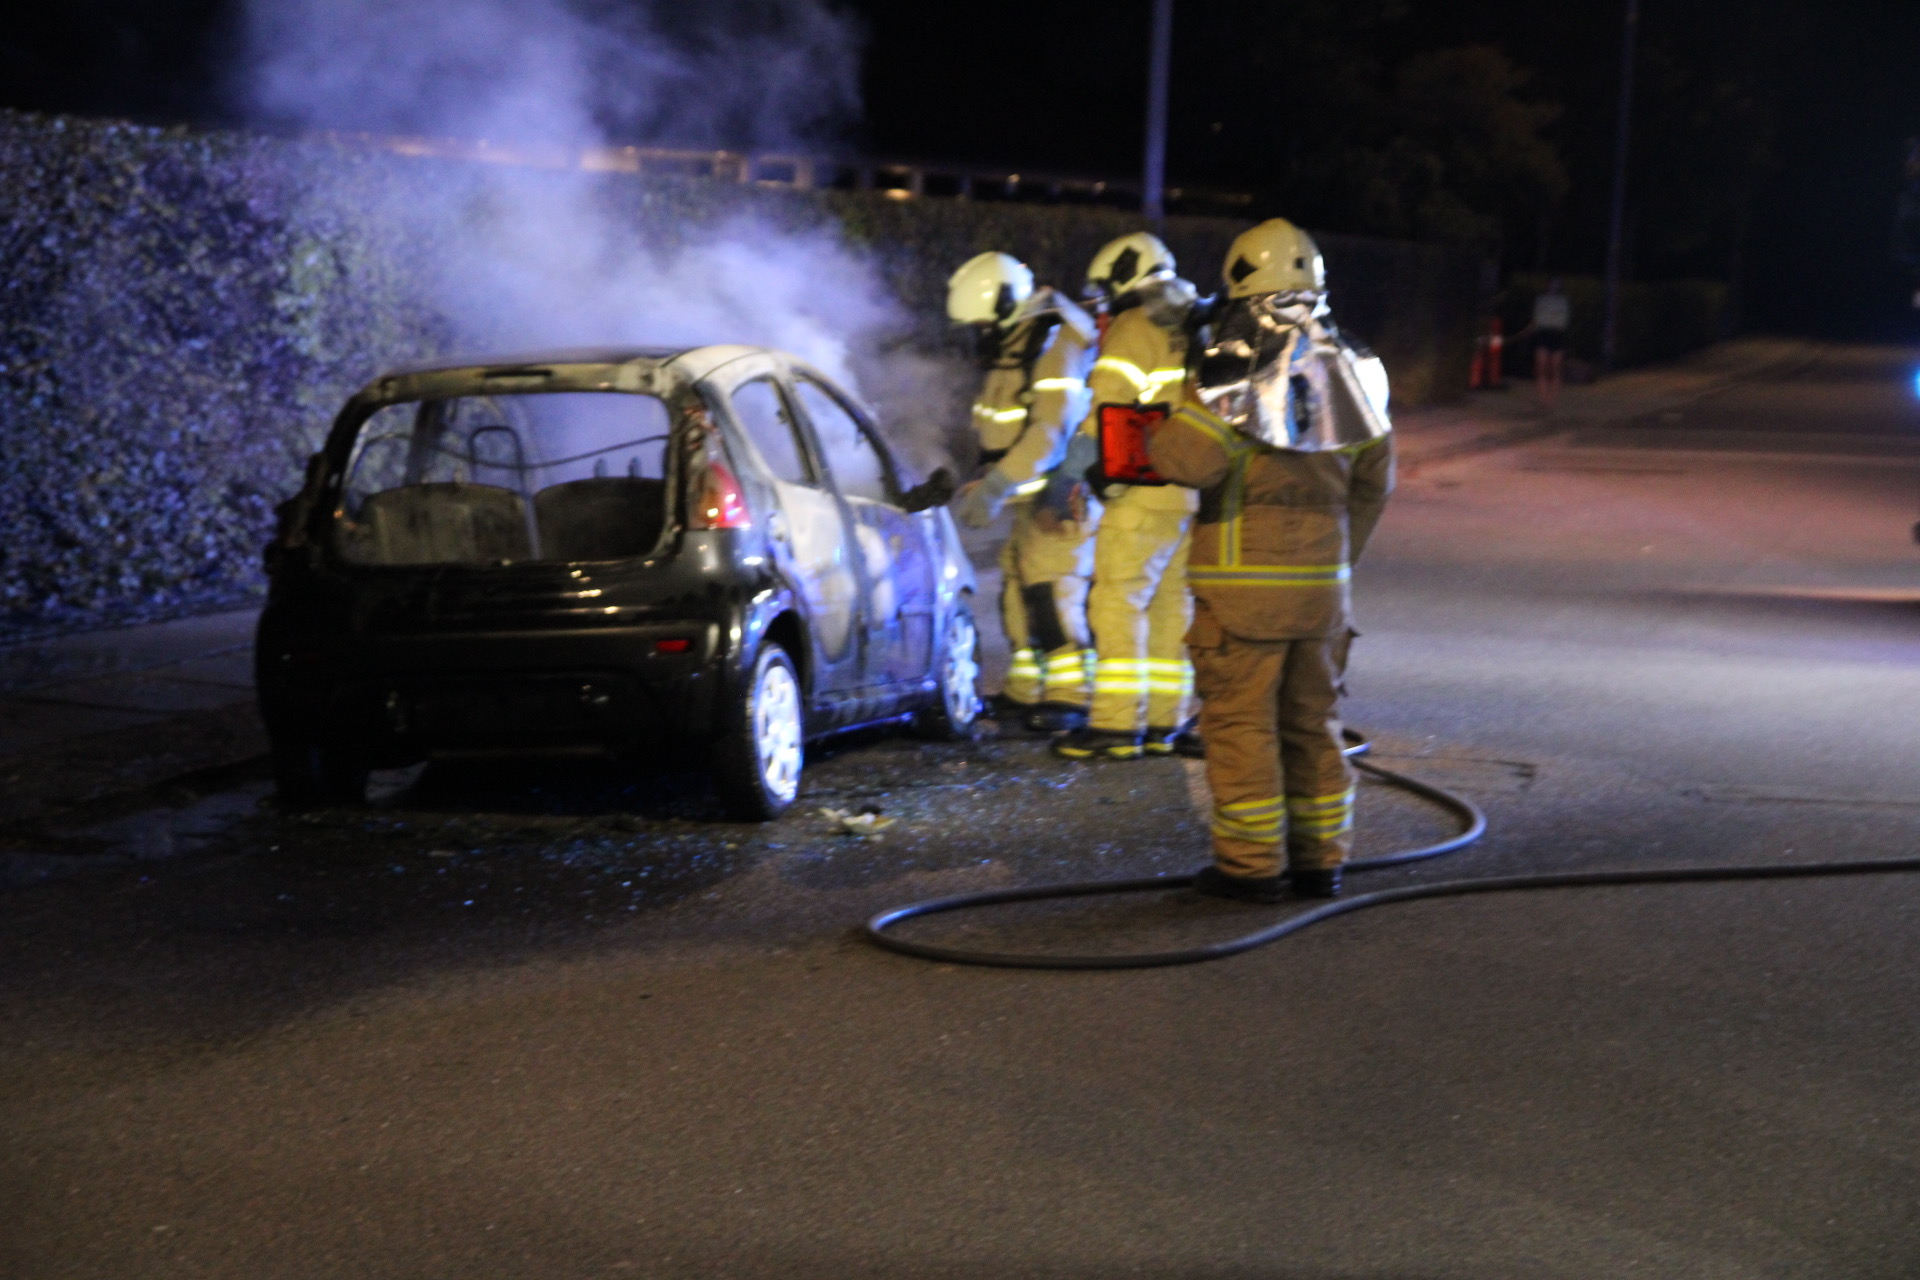 Mulig påsat bilbrand - politiet søger spor